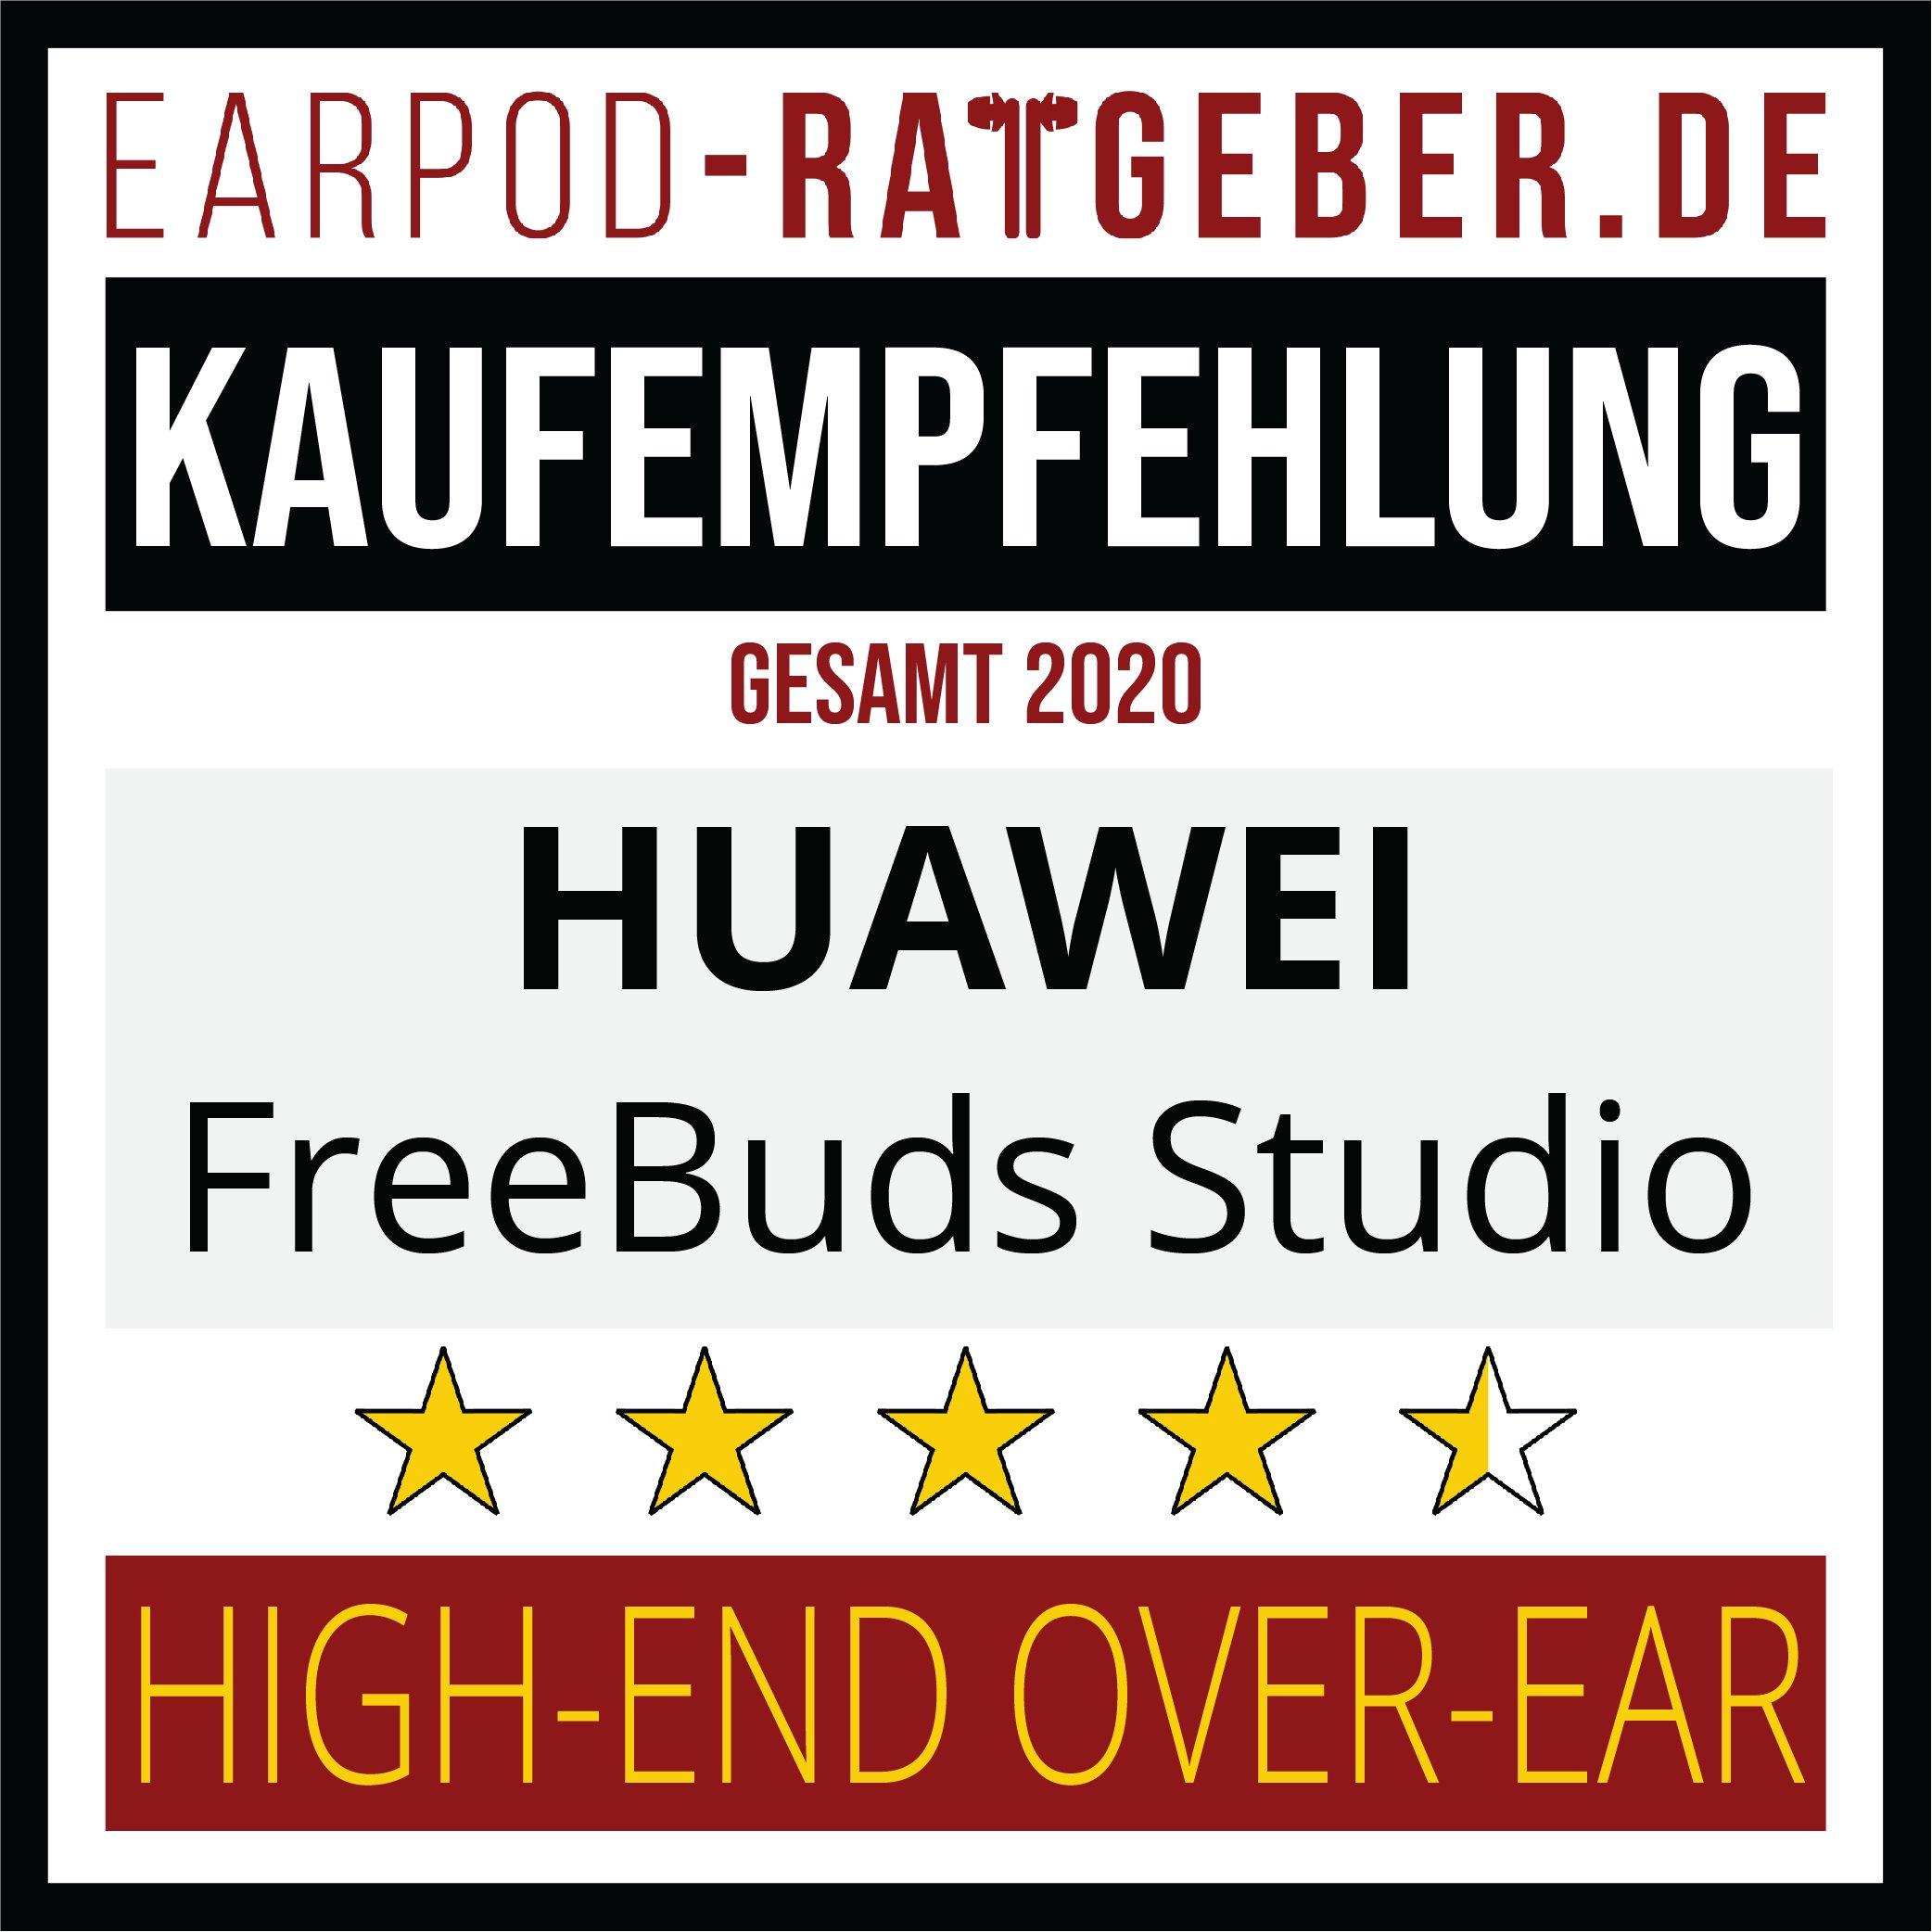 Die besten Kopfhörer 2020 Earpod-Ratgeber.de Awards huawei Empfehlung